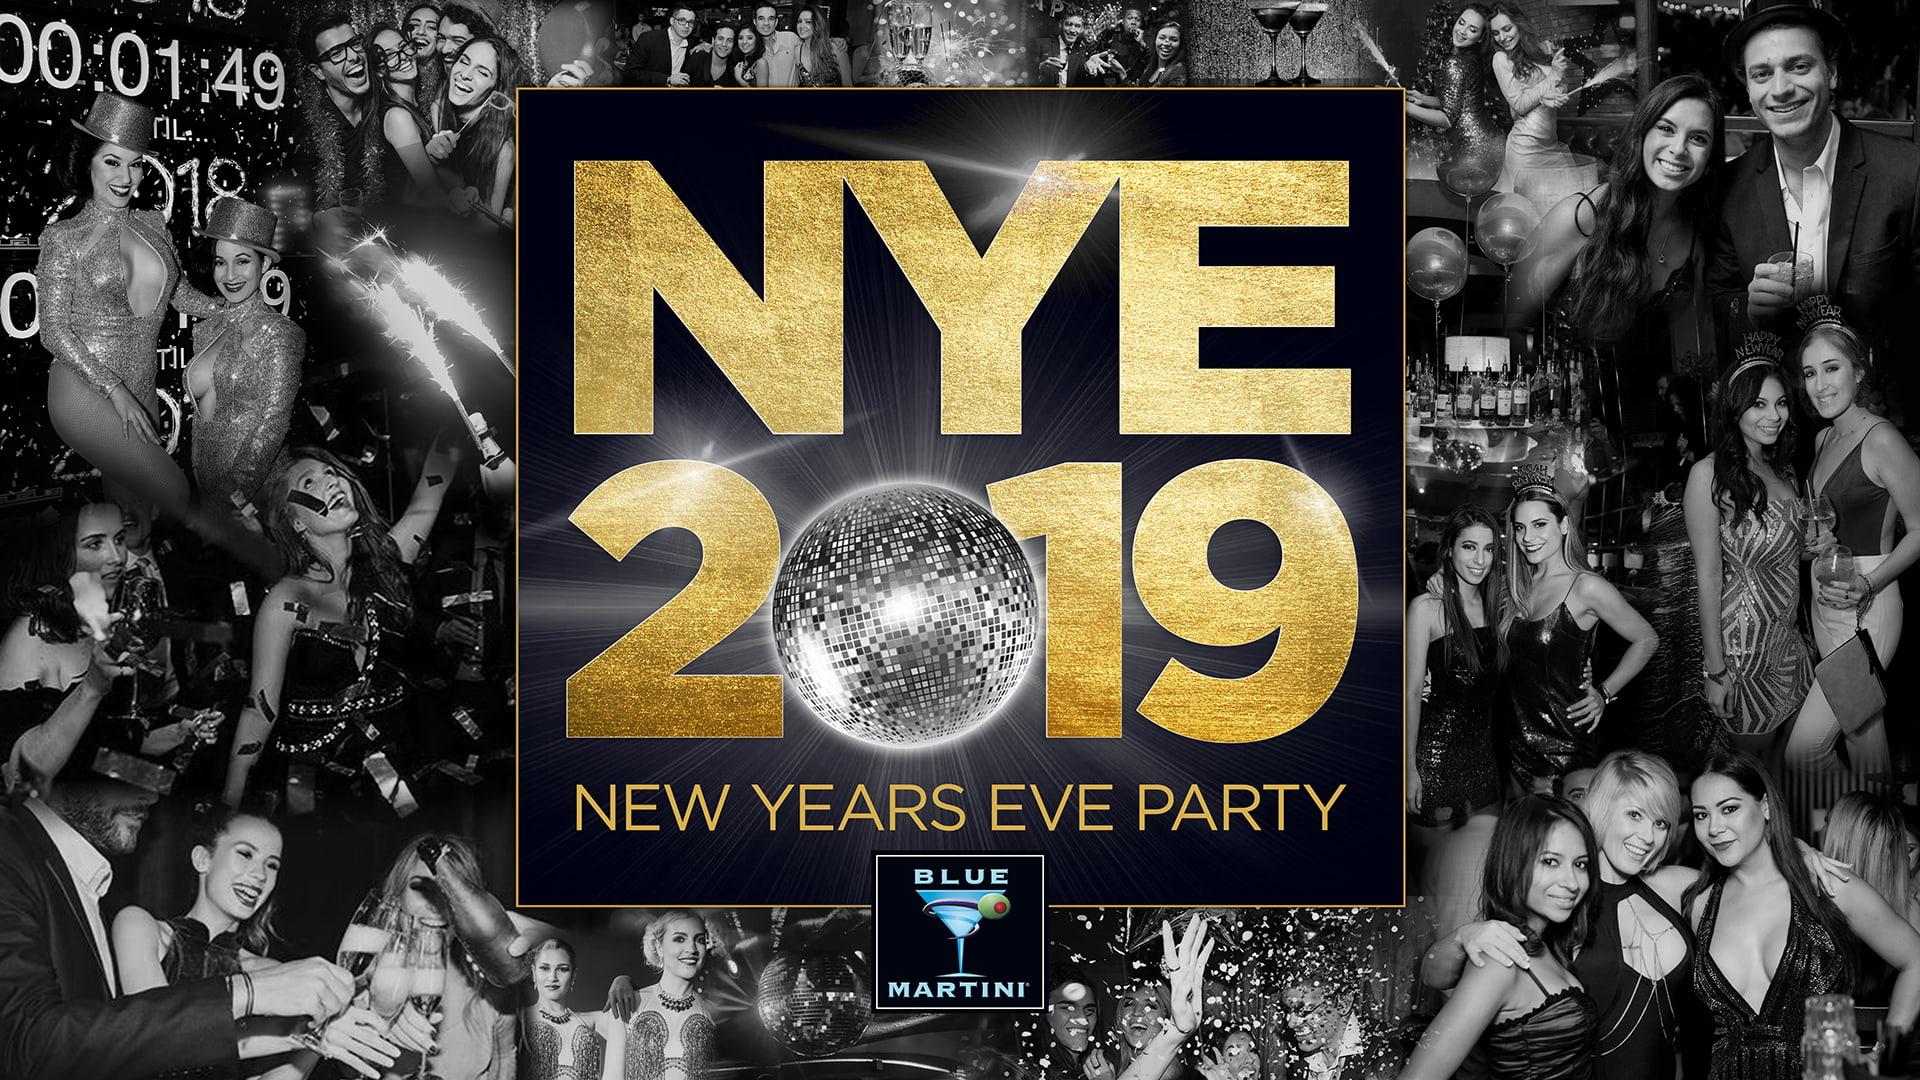 GOODBYE TO 2018..  HELLO 2019!